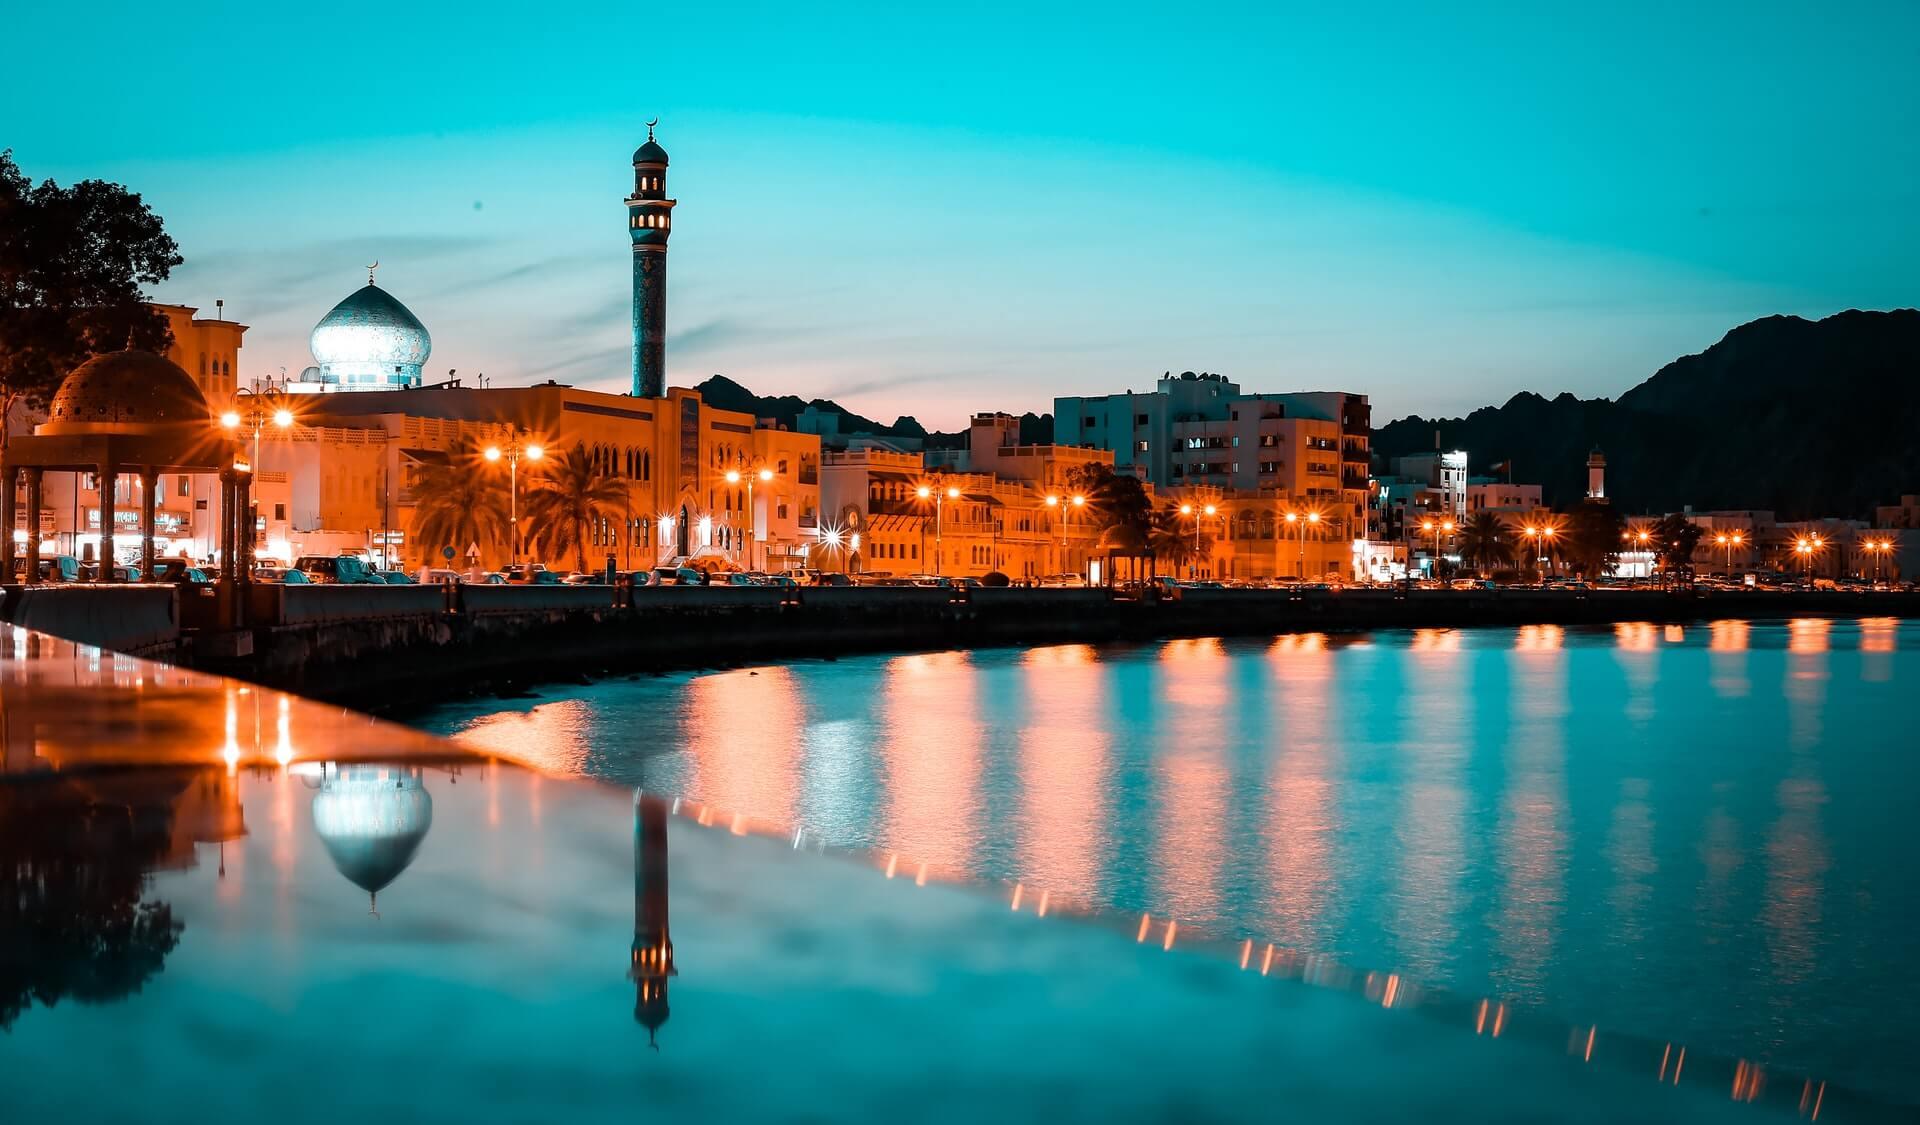 A beautiful night photo of Oman's capital city Muscat